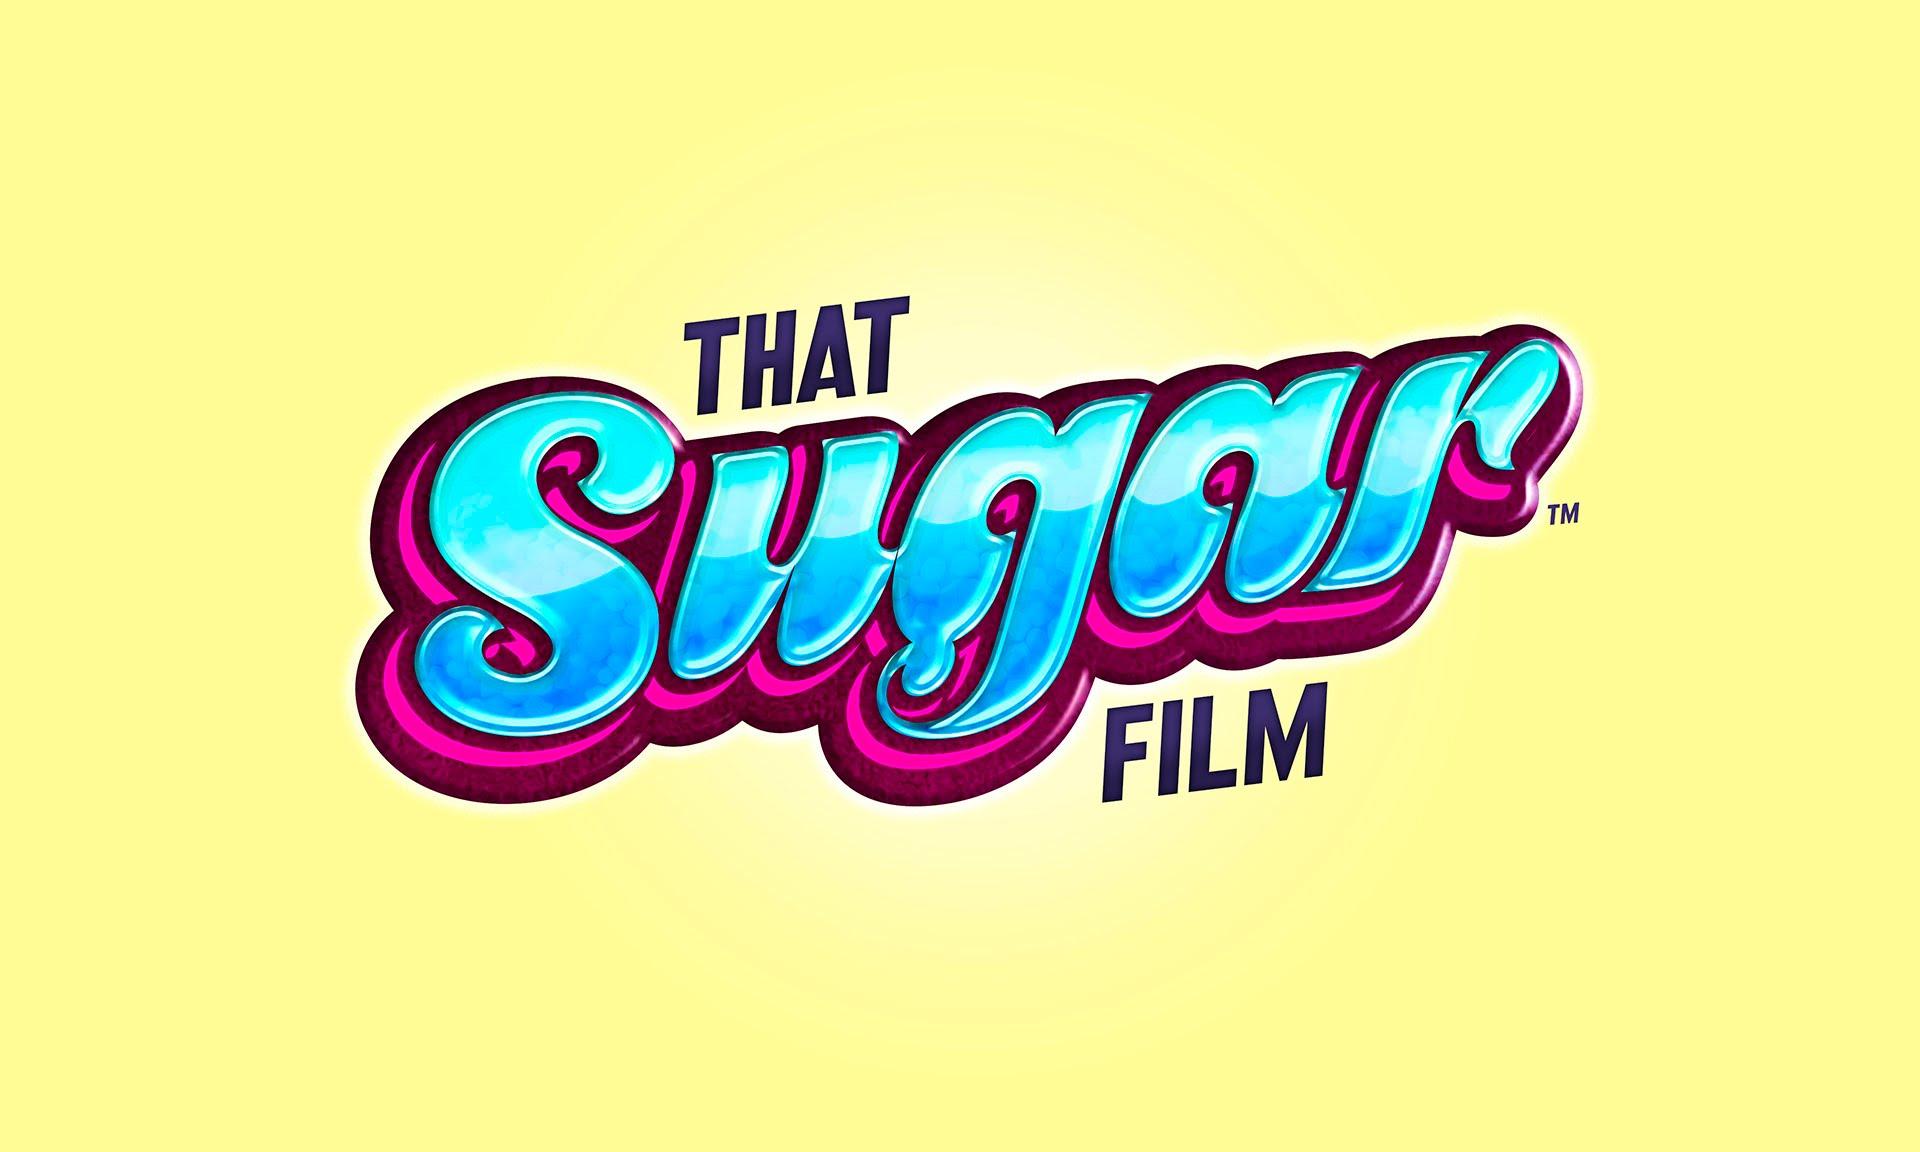 Must see: That Sugar Film